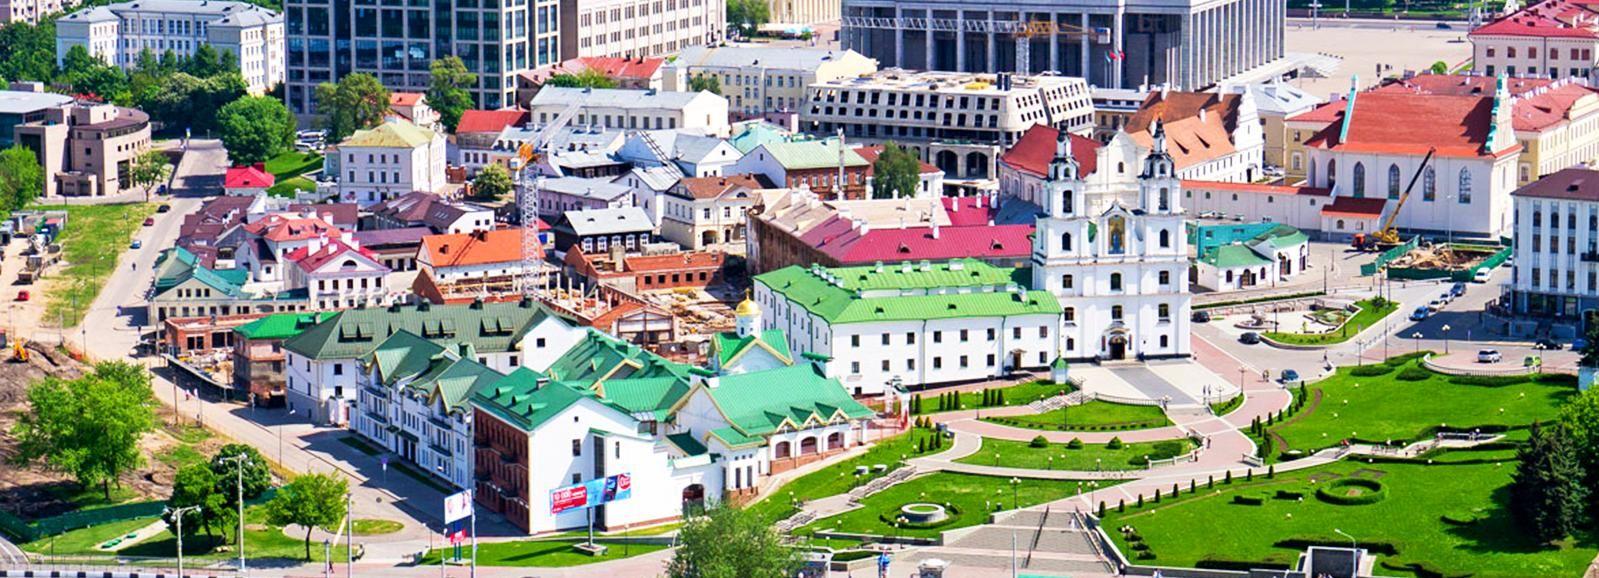 Minsk City: Small Group Walking Tour